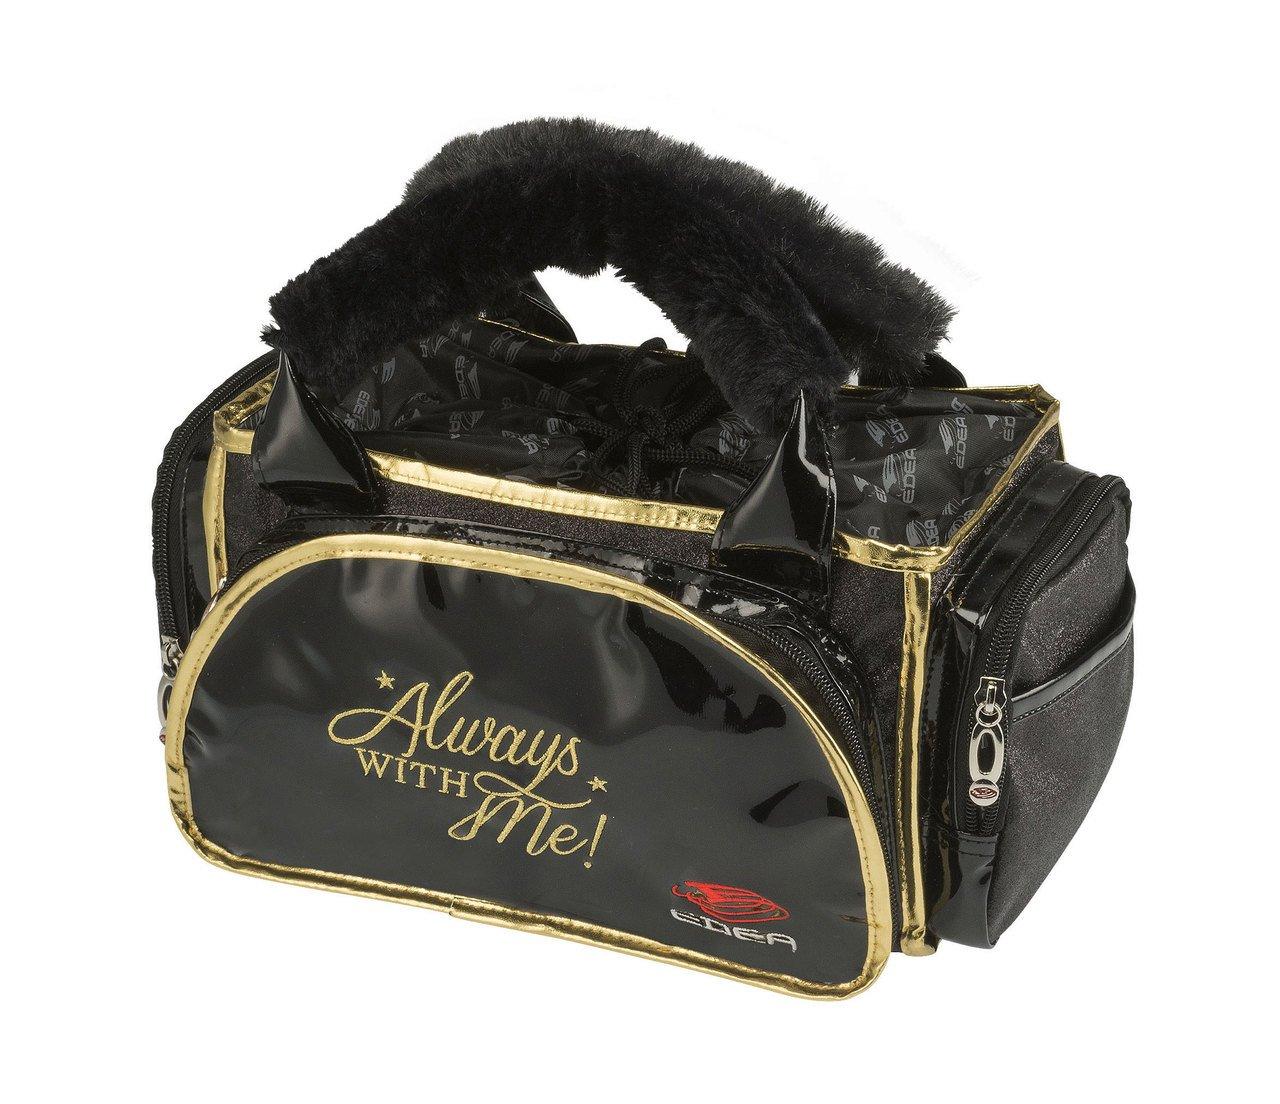 a59892a654ea Amazon.com : Edea Accessory Skate Bag (With Me) : Sports & Outdoors